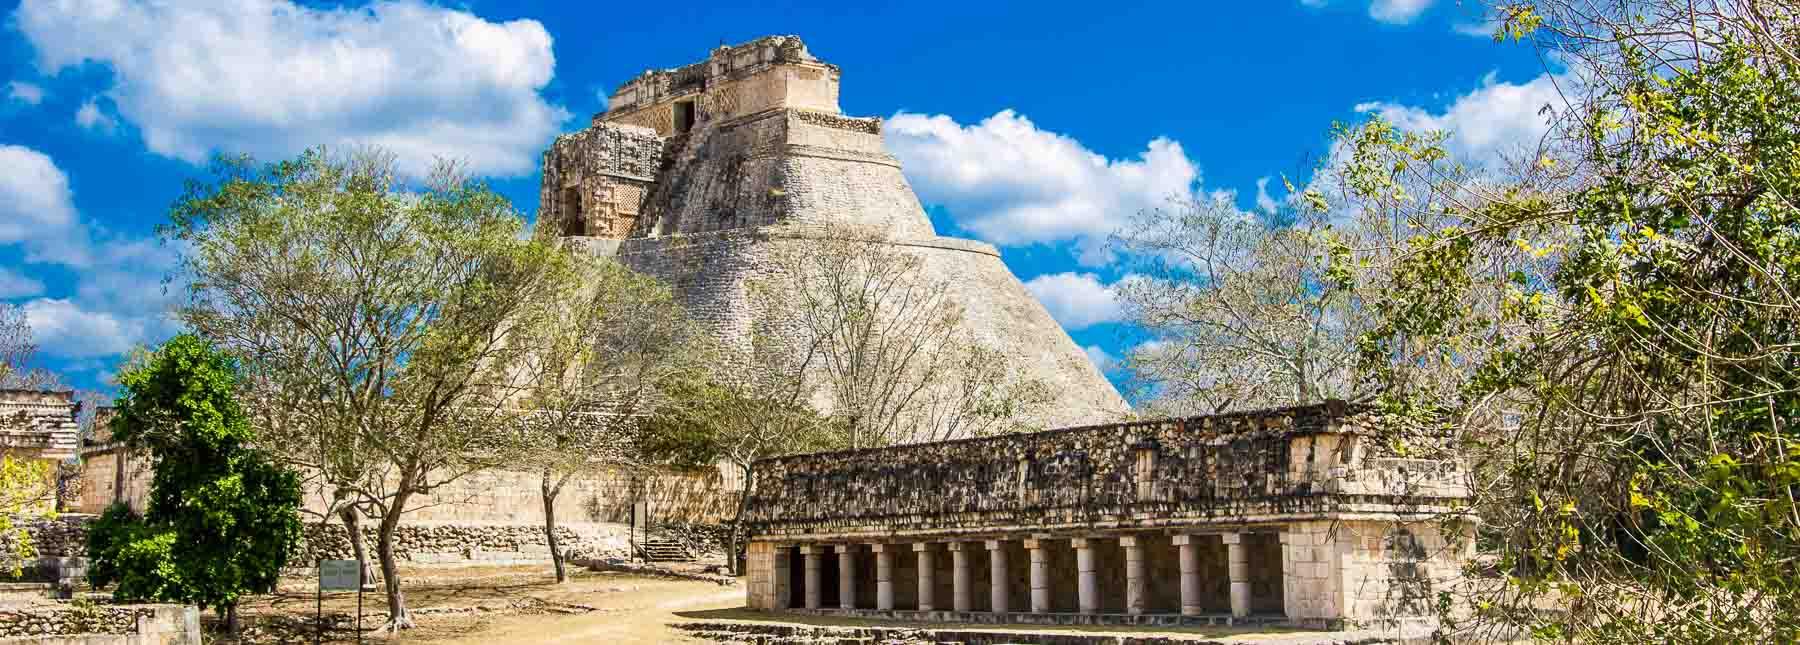 Mexico Road Trip, Mayan Ruins in Yucatan Peninsula